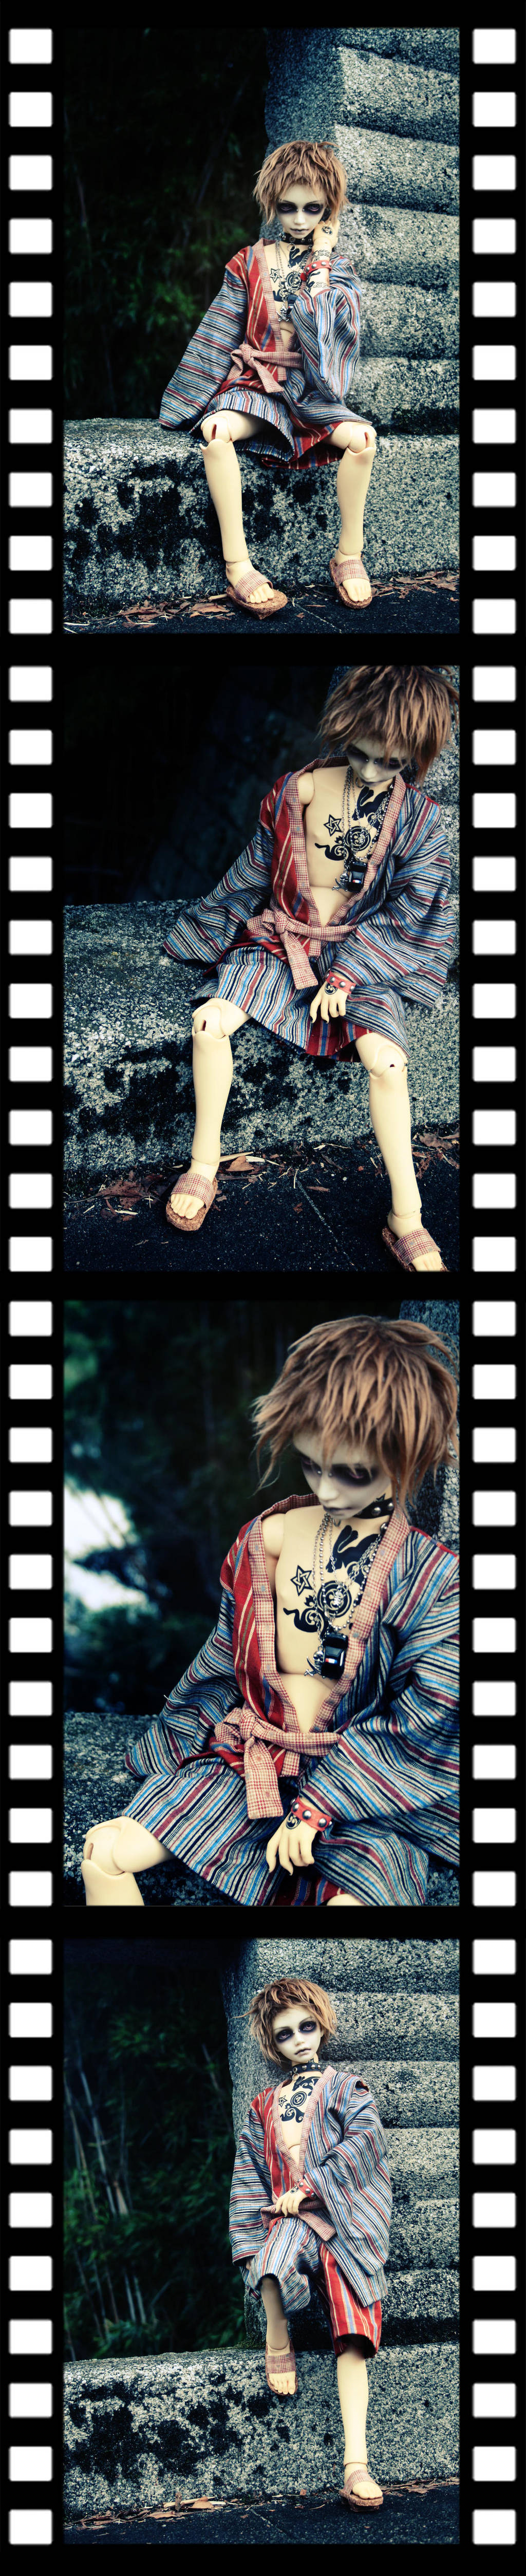 Matsuri Style 4 by onegreyelephant